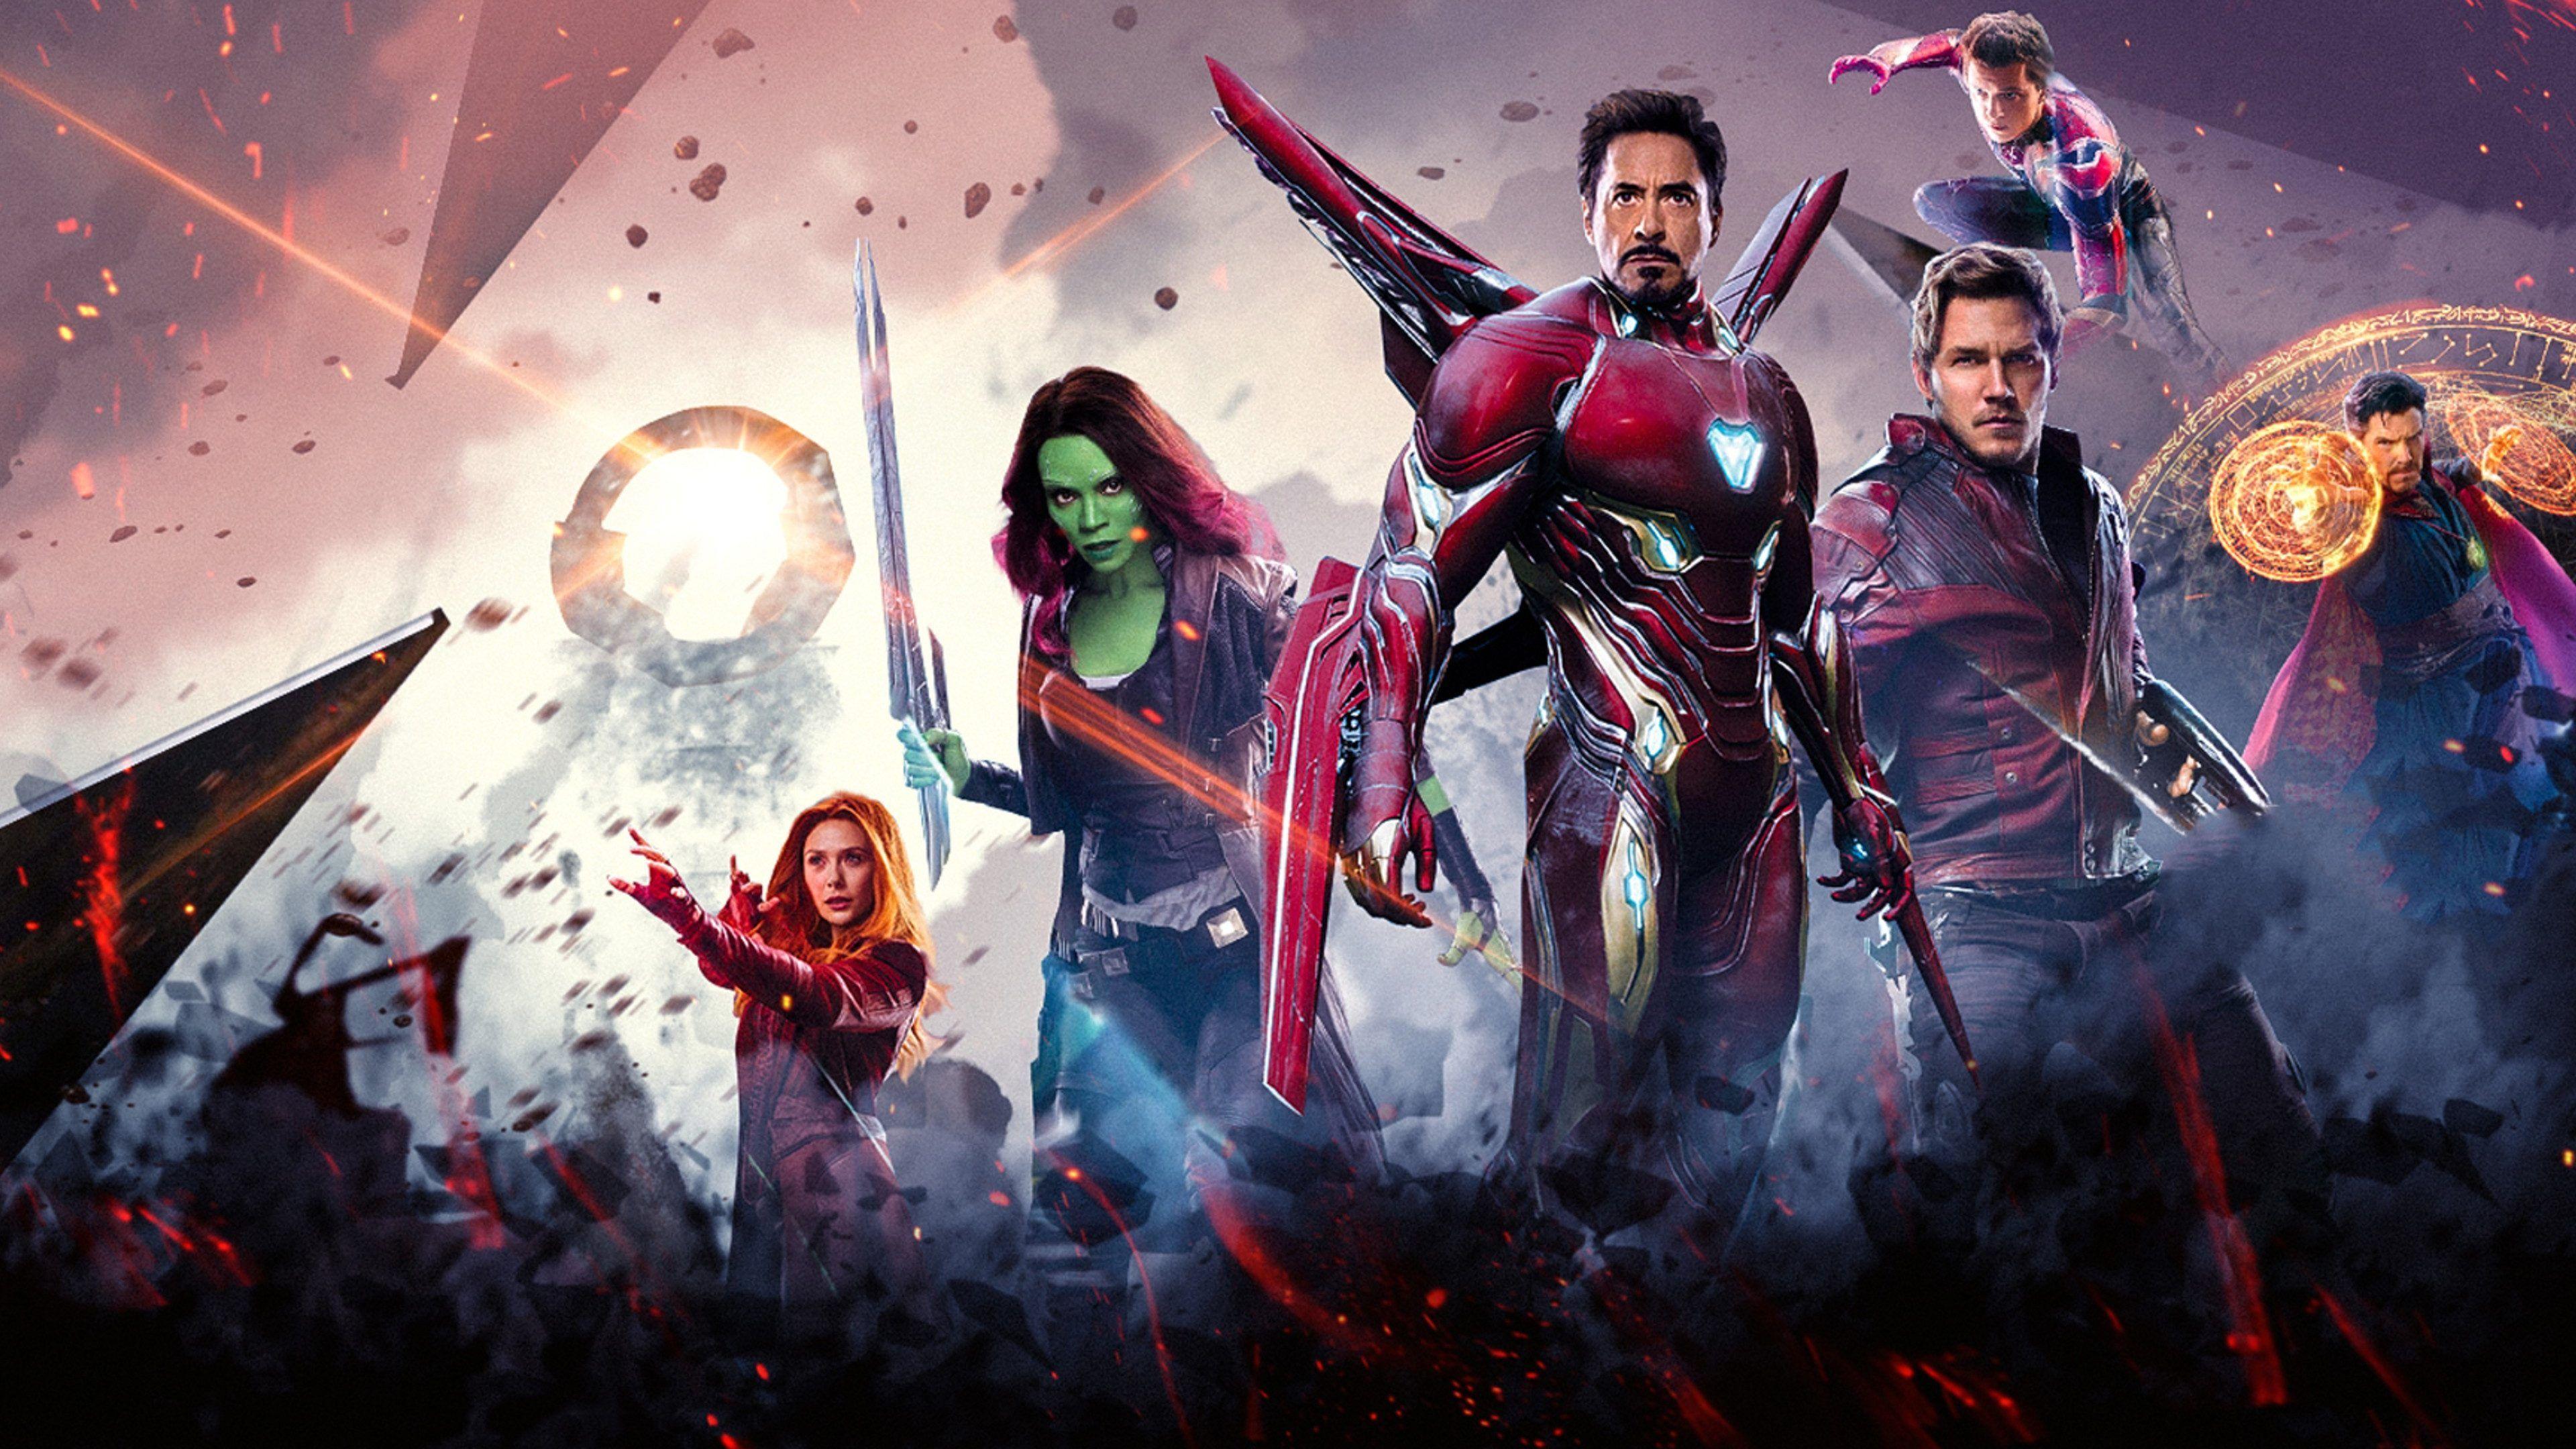 Marvel Infinity War 3840 X 2160 Wallpapers Top Free Marvel Infinity War 3840 X 2160 Backgrounds Wallpaperaccess